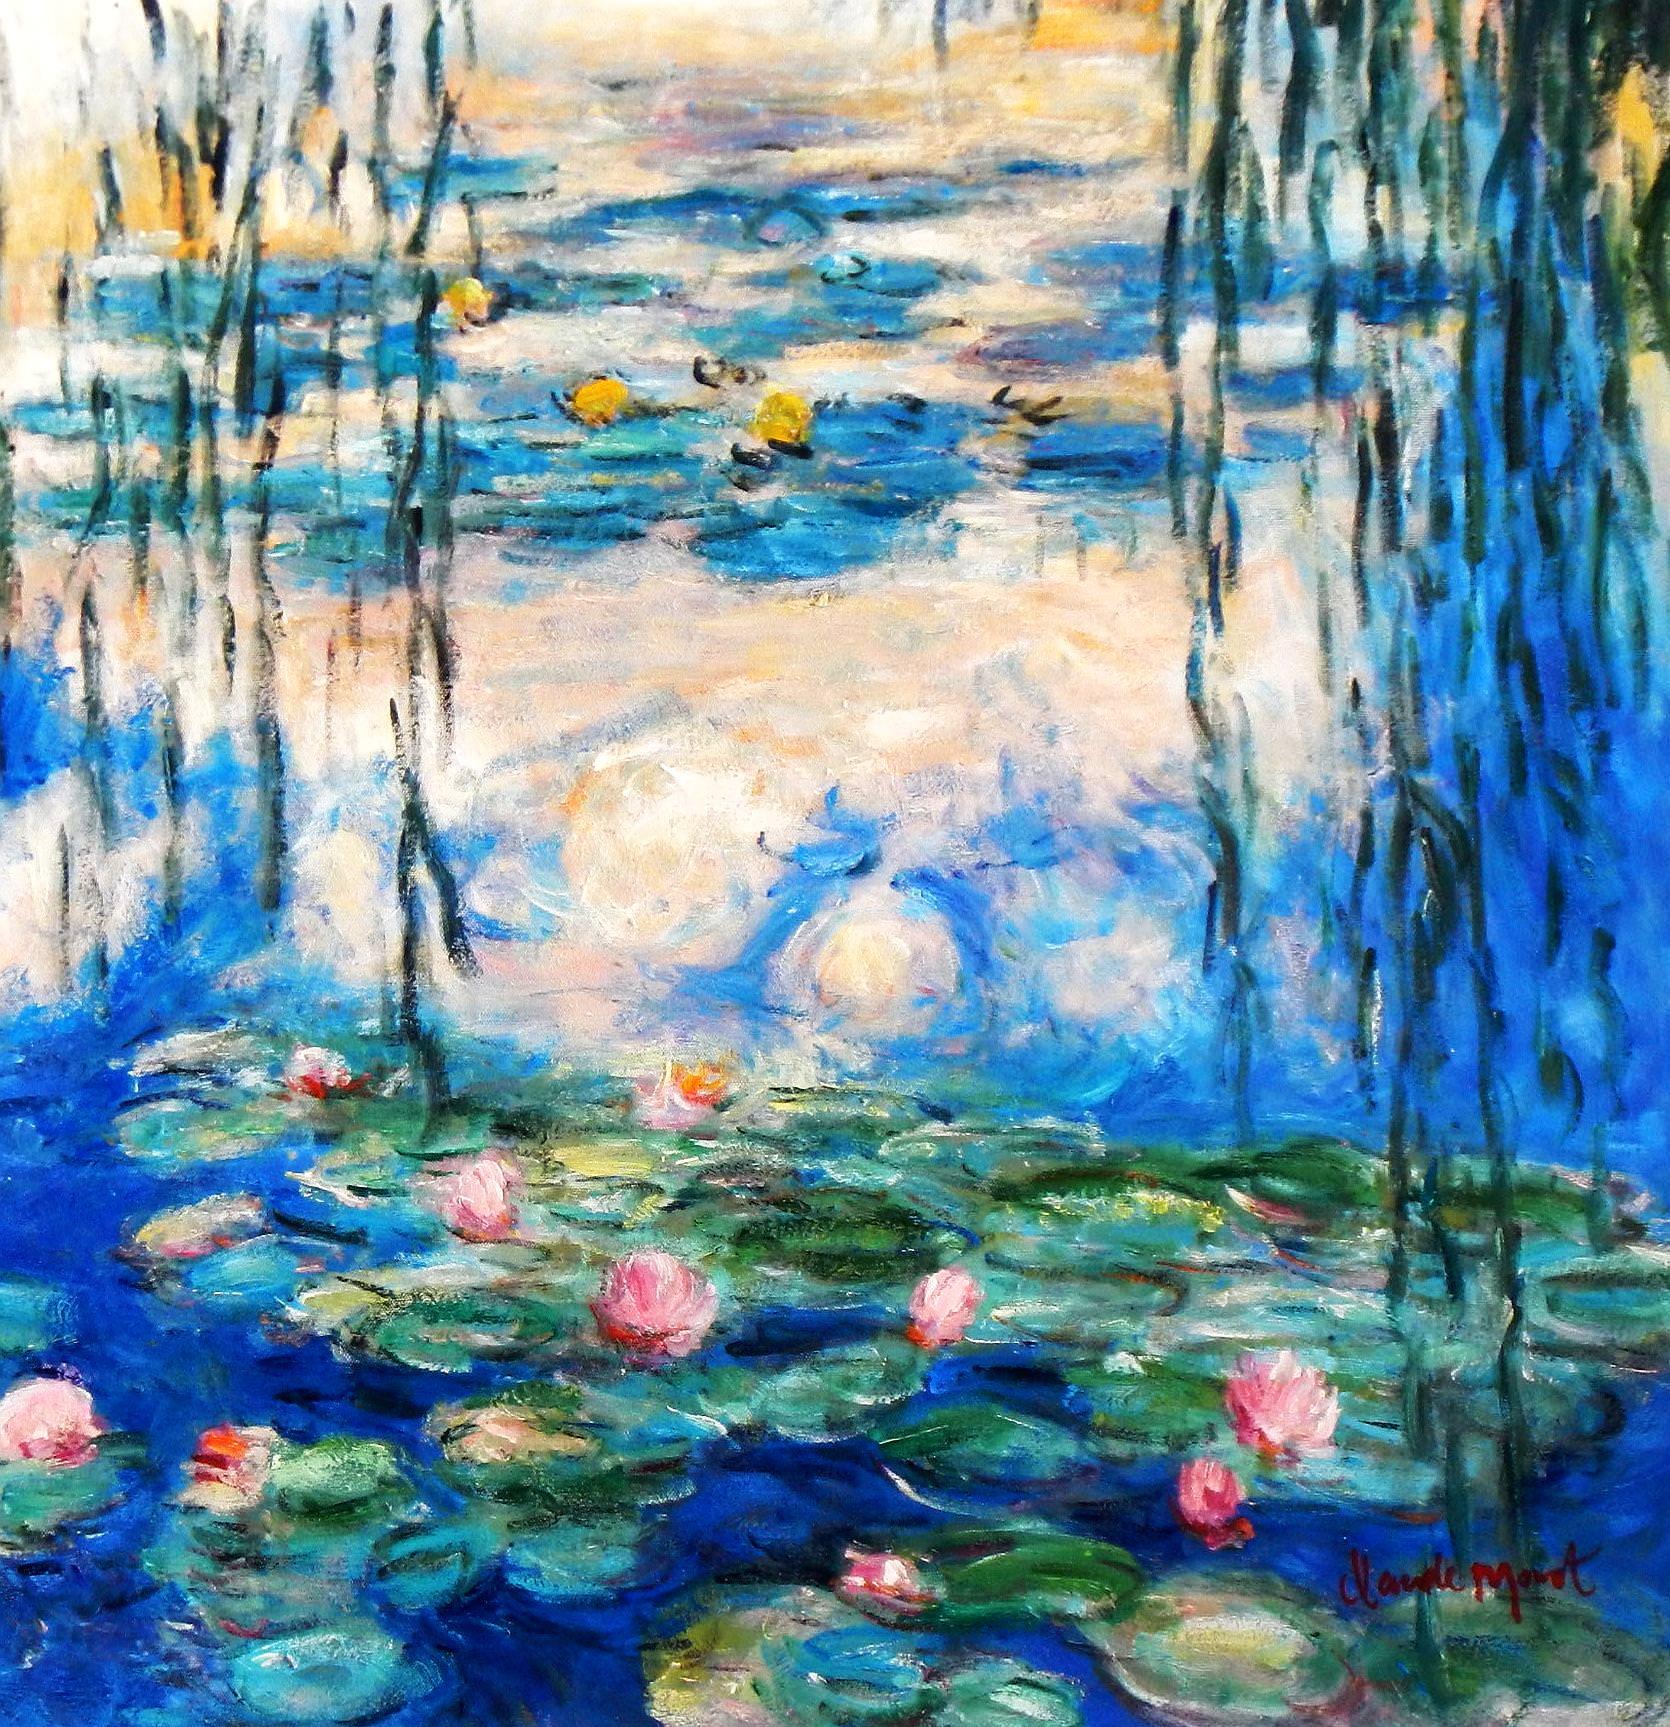 Claude Monet - Seerosen & Weiden e93976 60x60cm Ölbild handgemalt